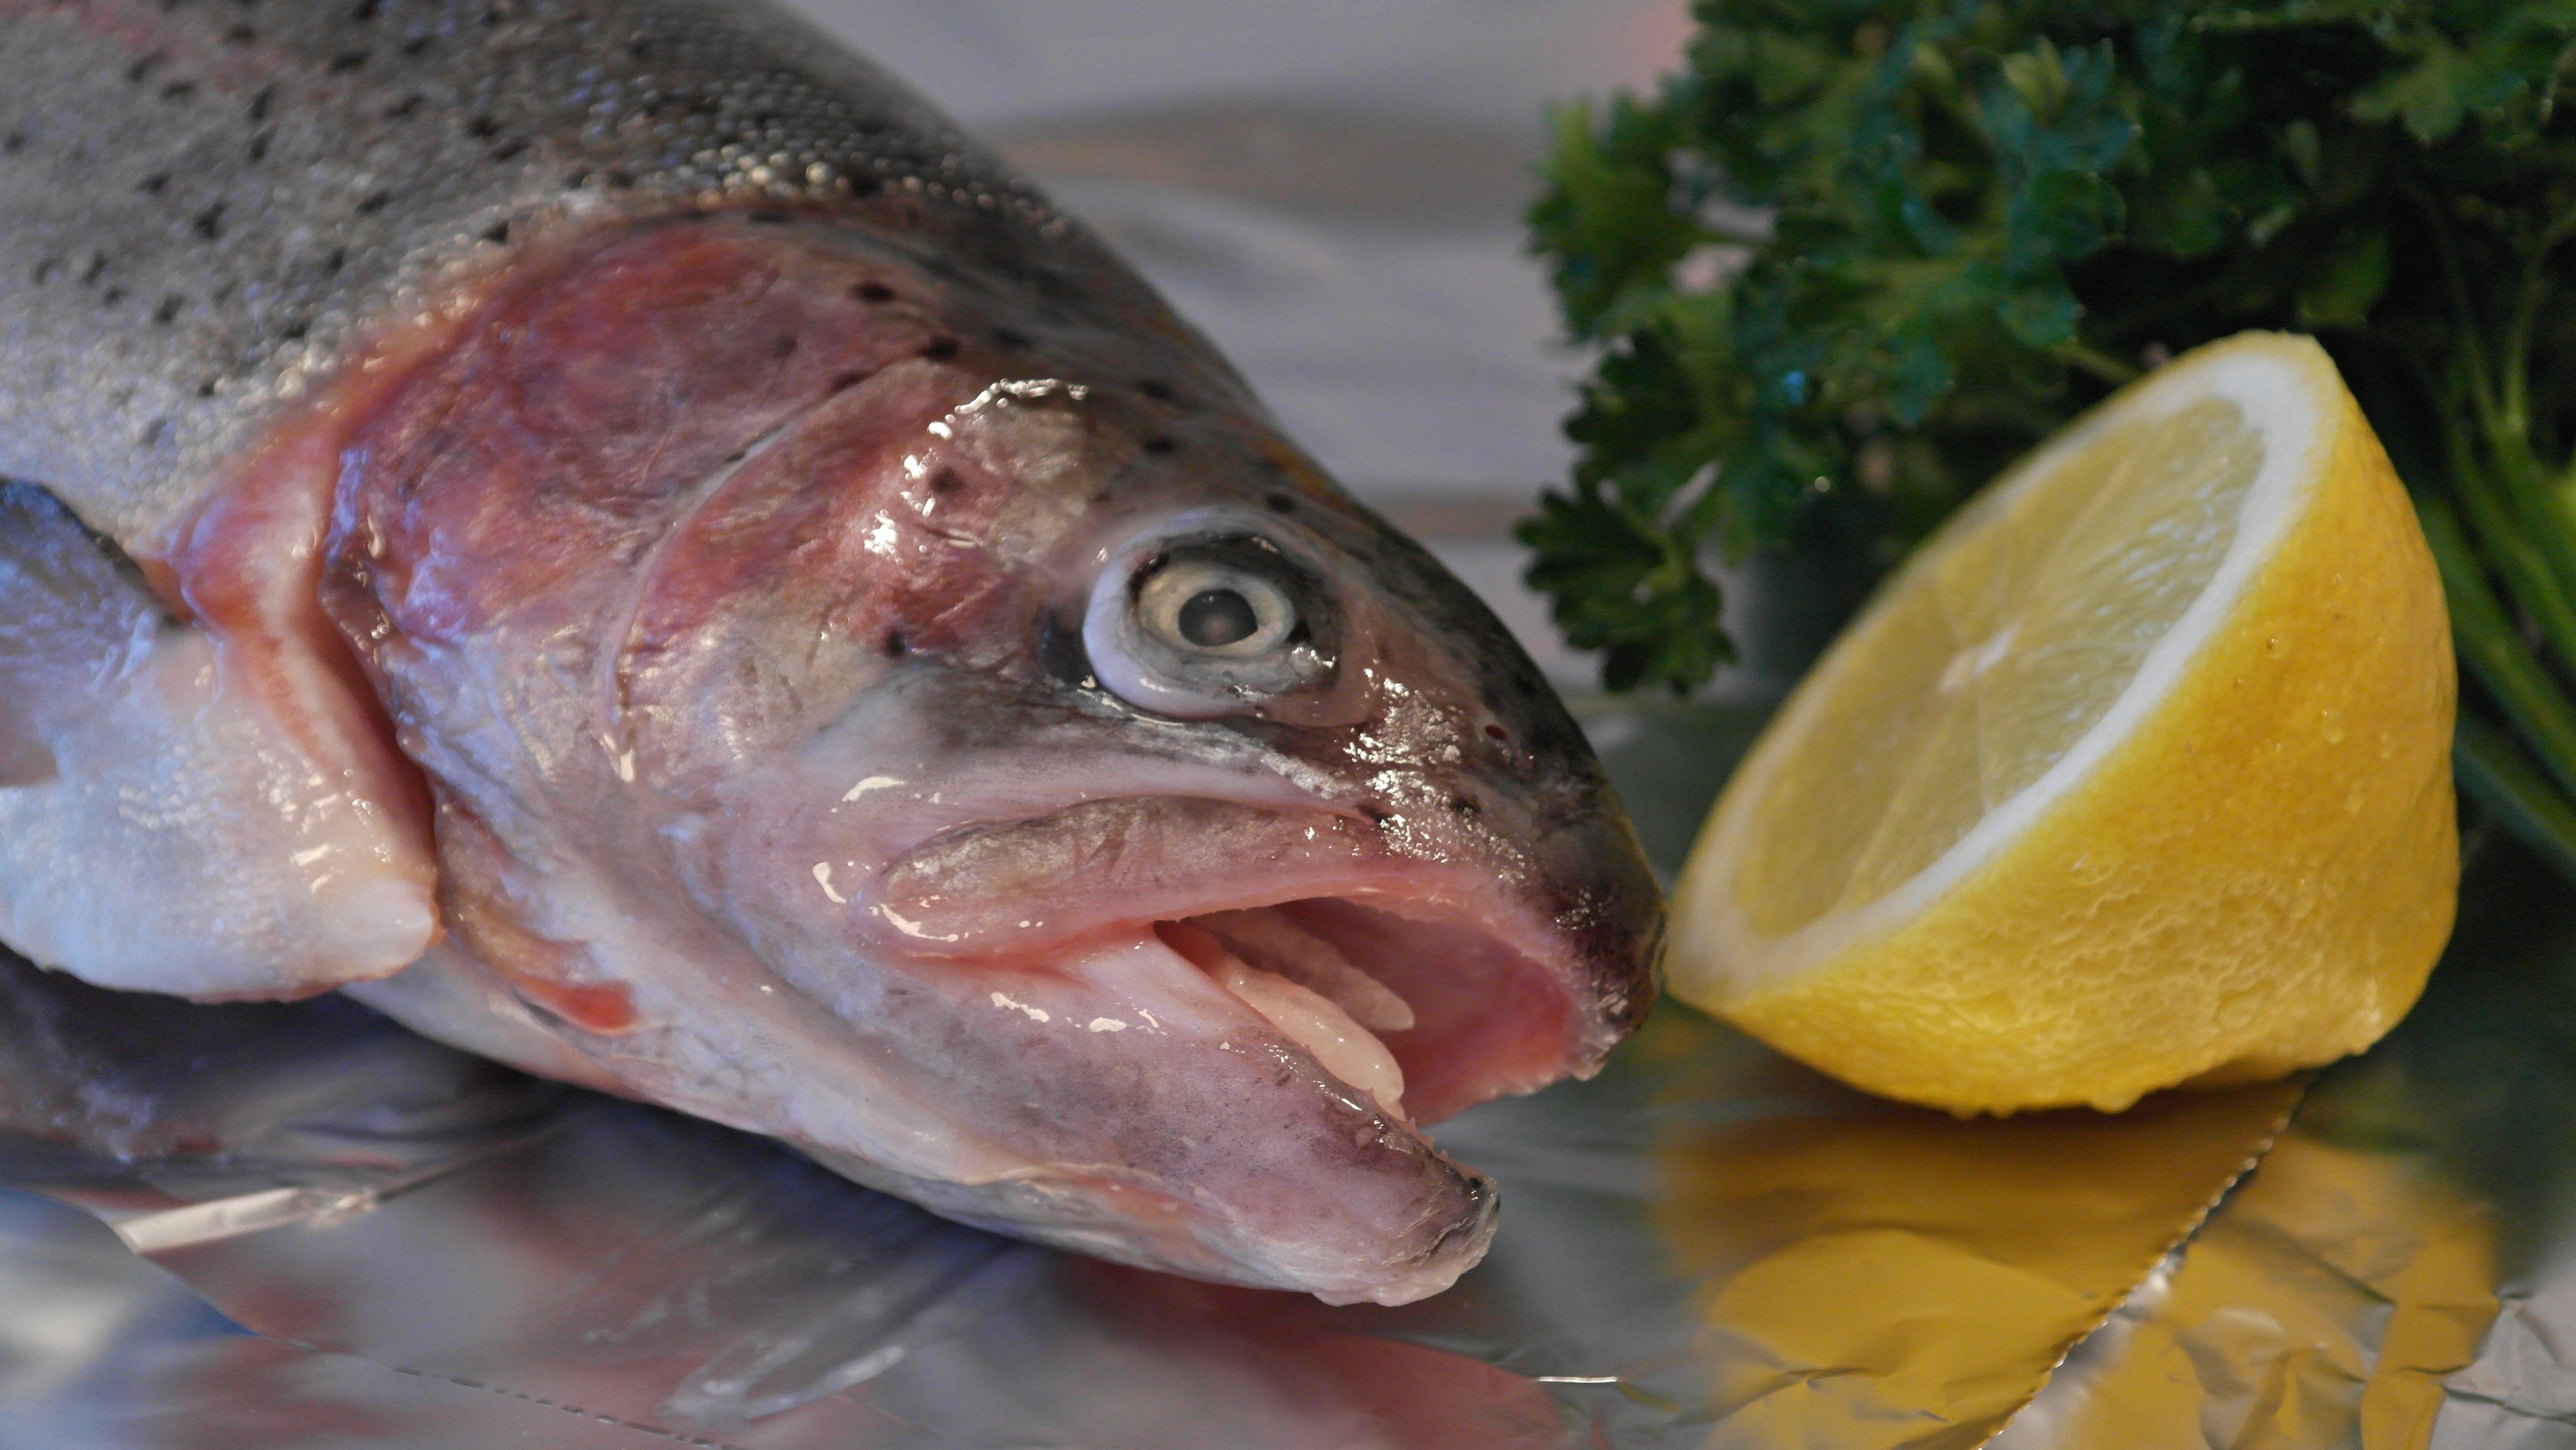 Fotos gratis comida perca mariscos comer lim n for Is tilapia a good fish to eat